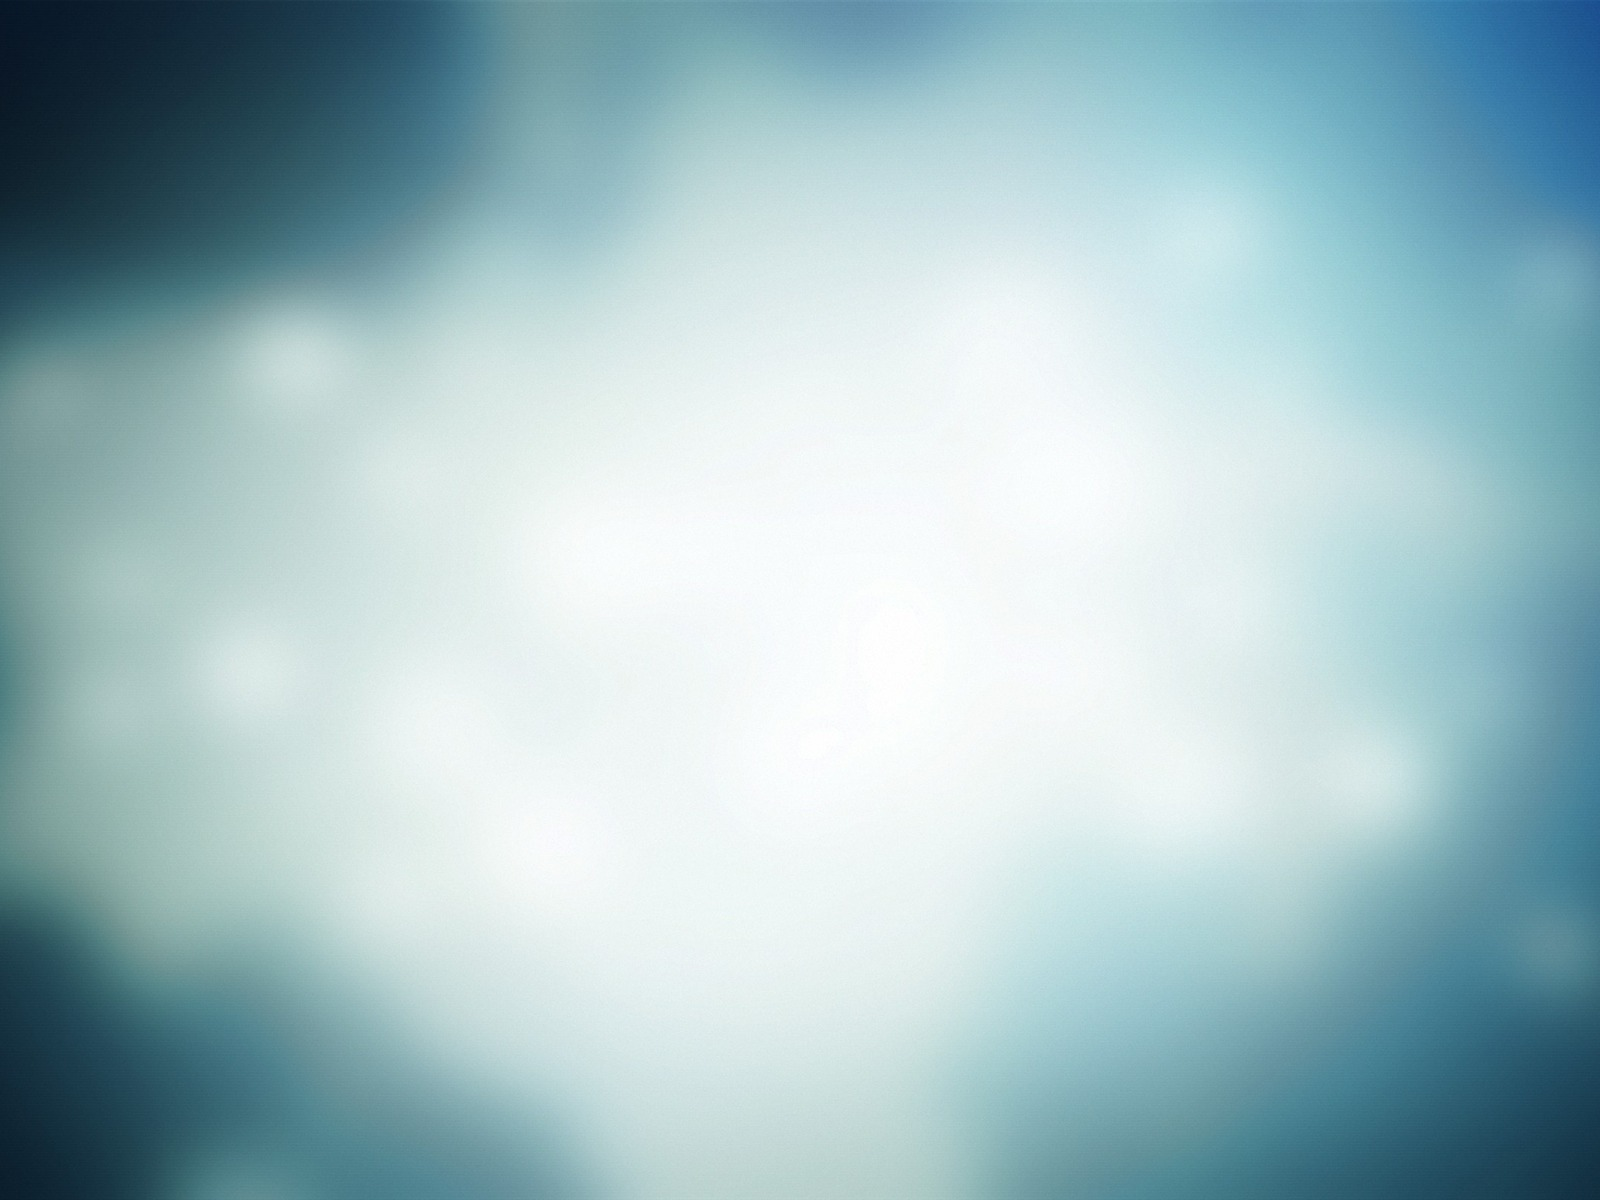 light blue white Design HD wallpaper   1600x1200 wallpaper download 1600x1200